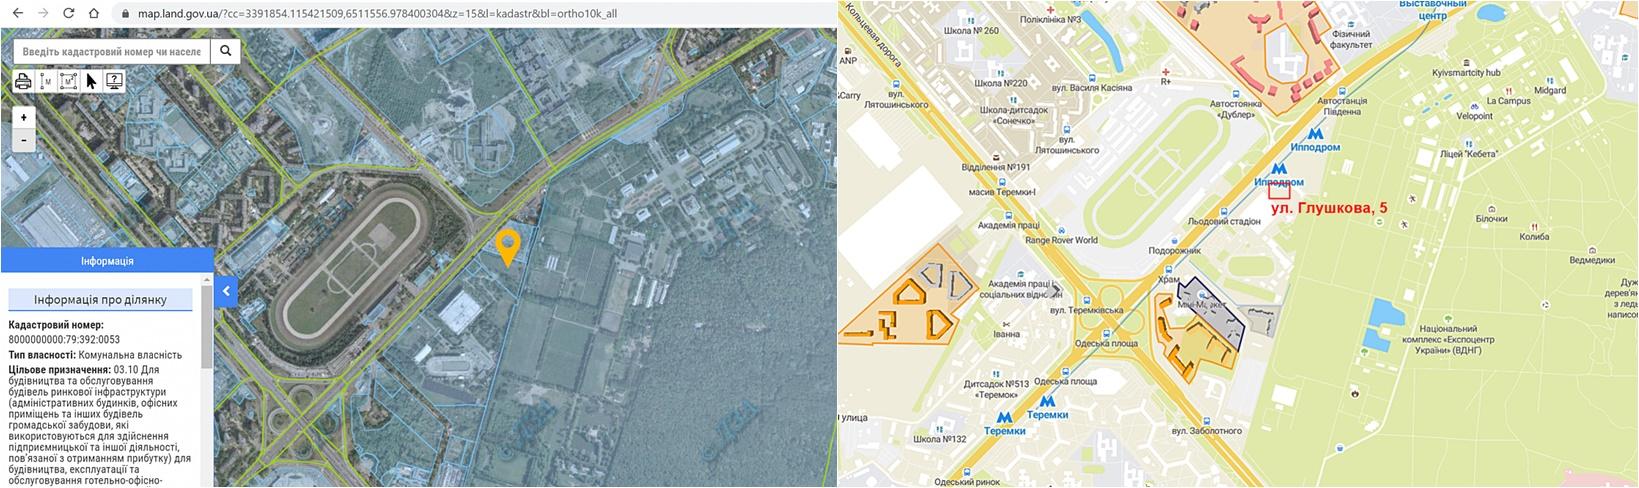 Проект МФК по улице Академика Глушкова, 5 данные кадастра и на карте